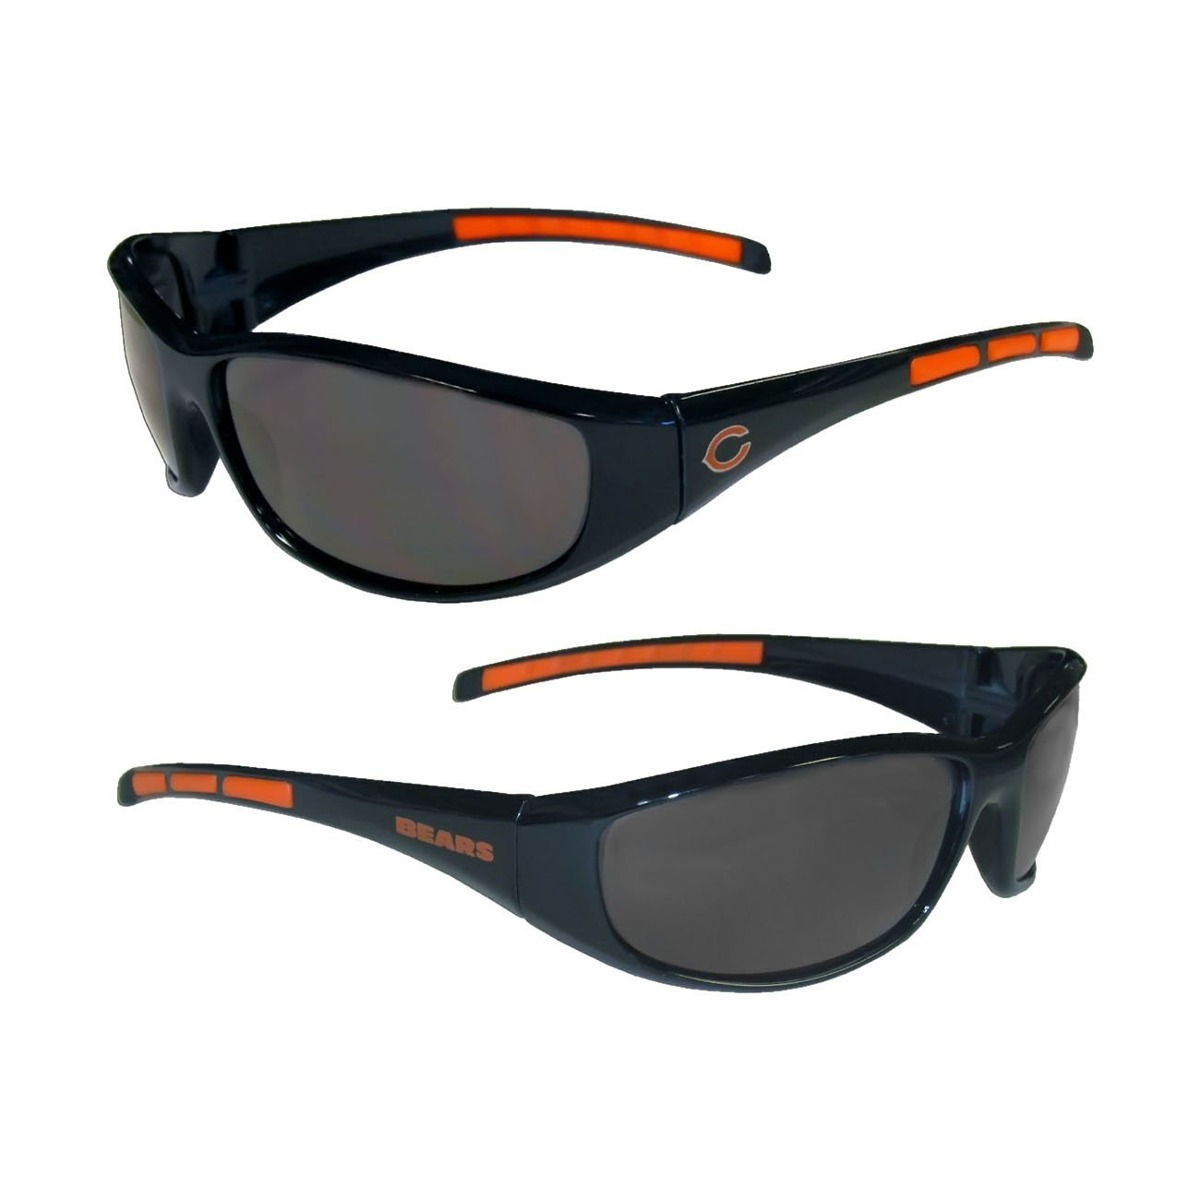 Gafas de sol siskiyou gifts co inc con protección uv jpg 1200x1200 Sol con  inc 96d2c38006